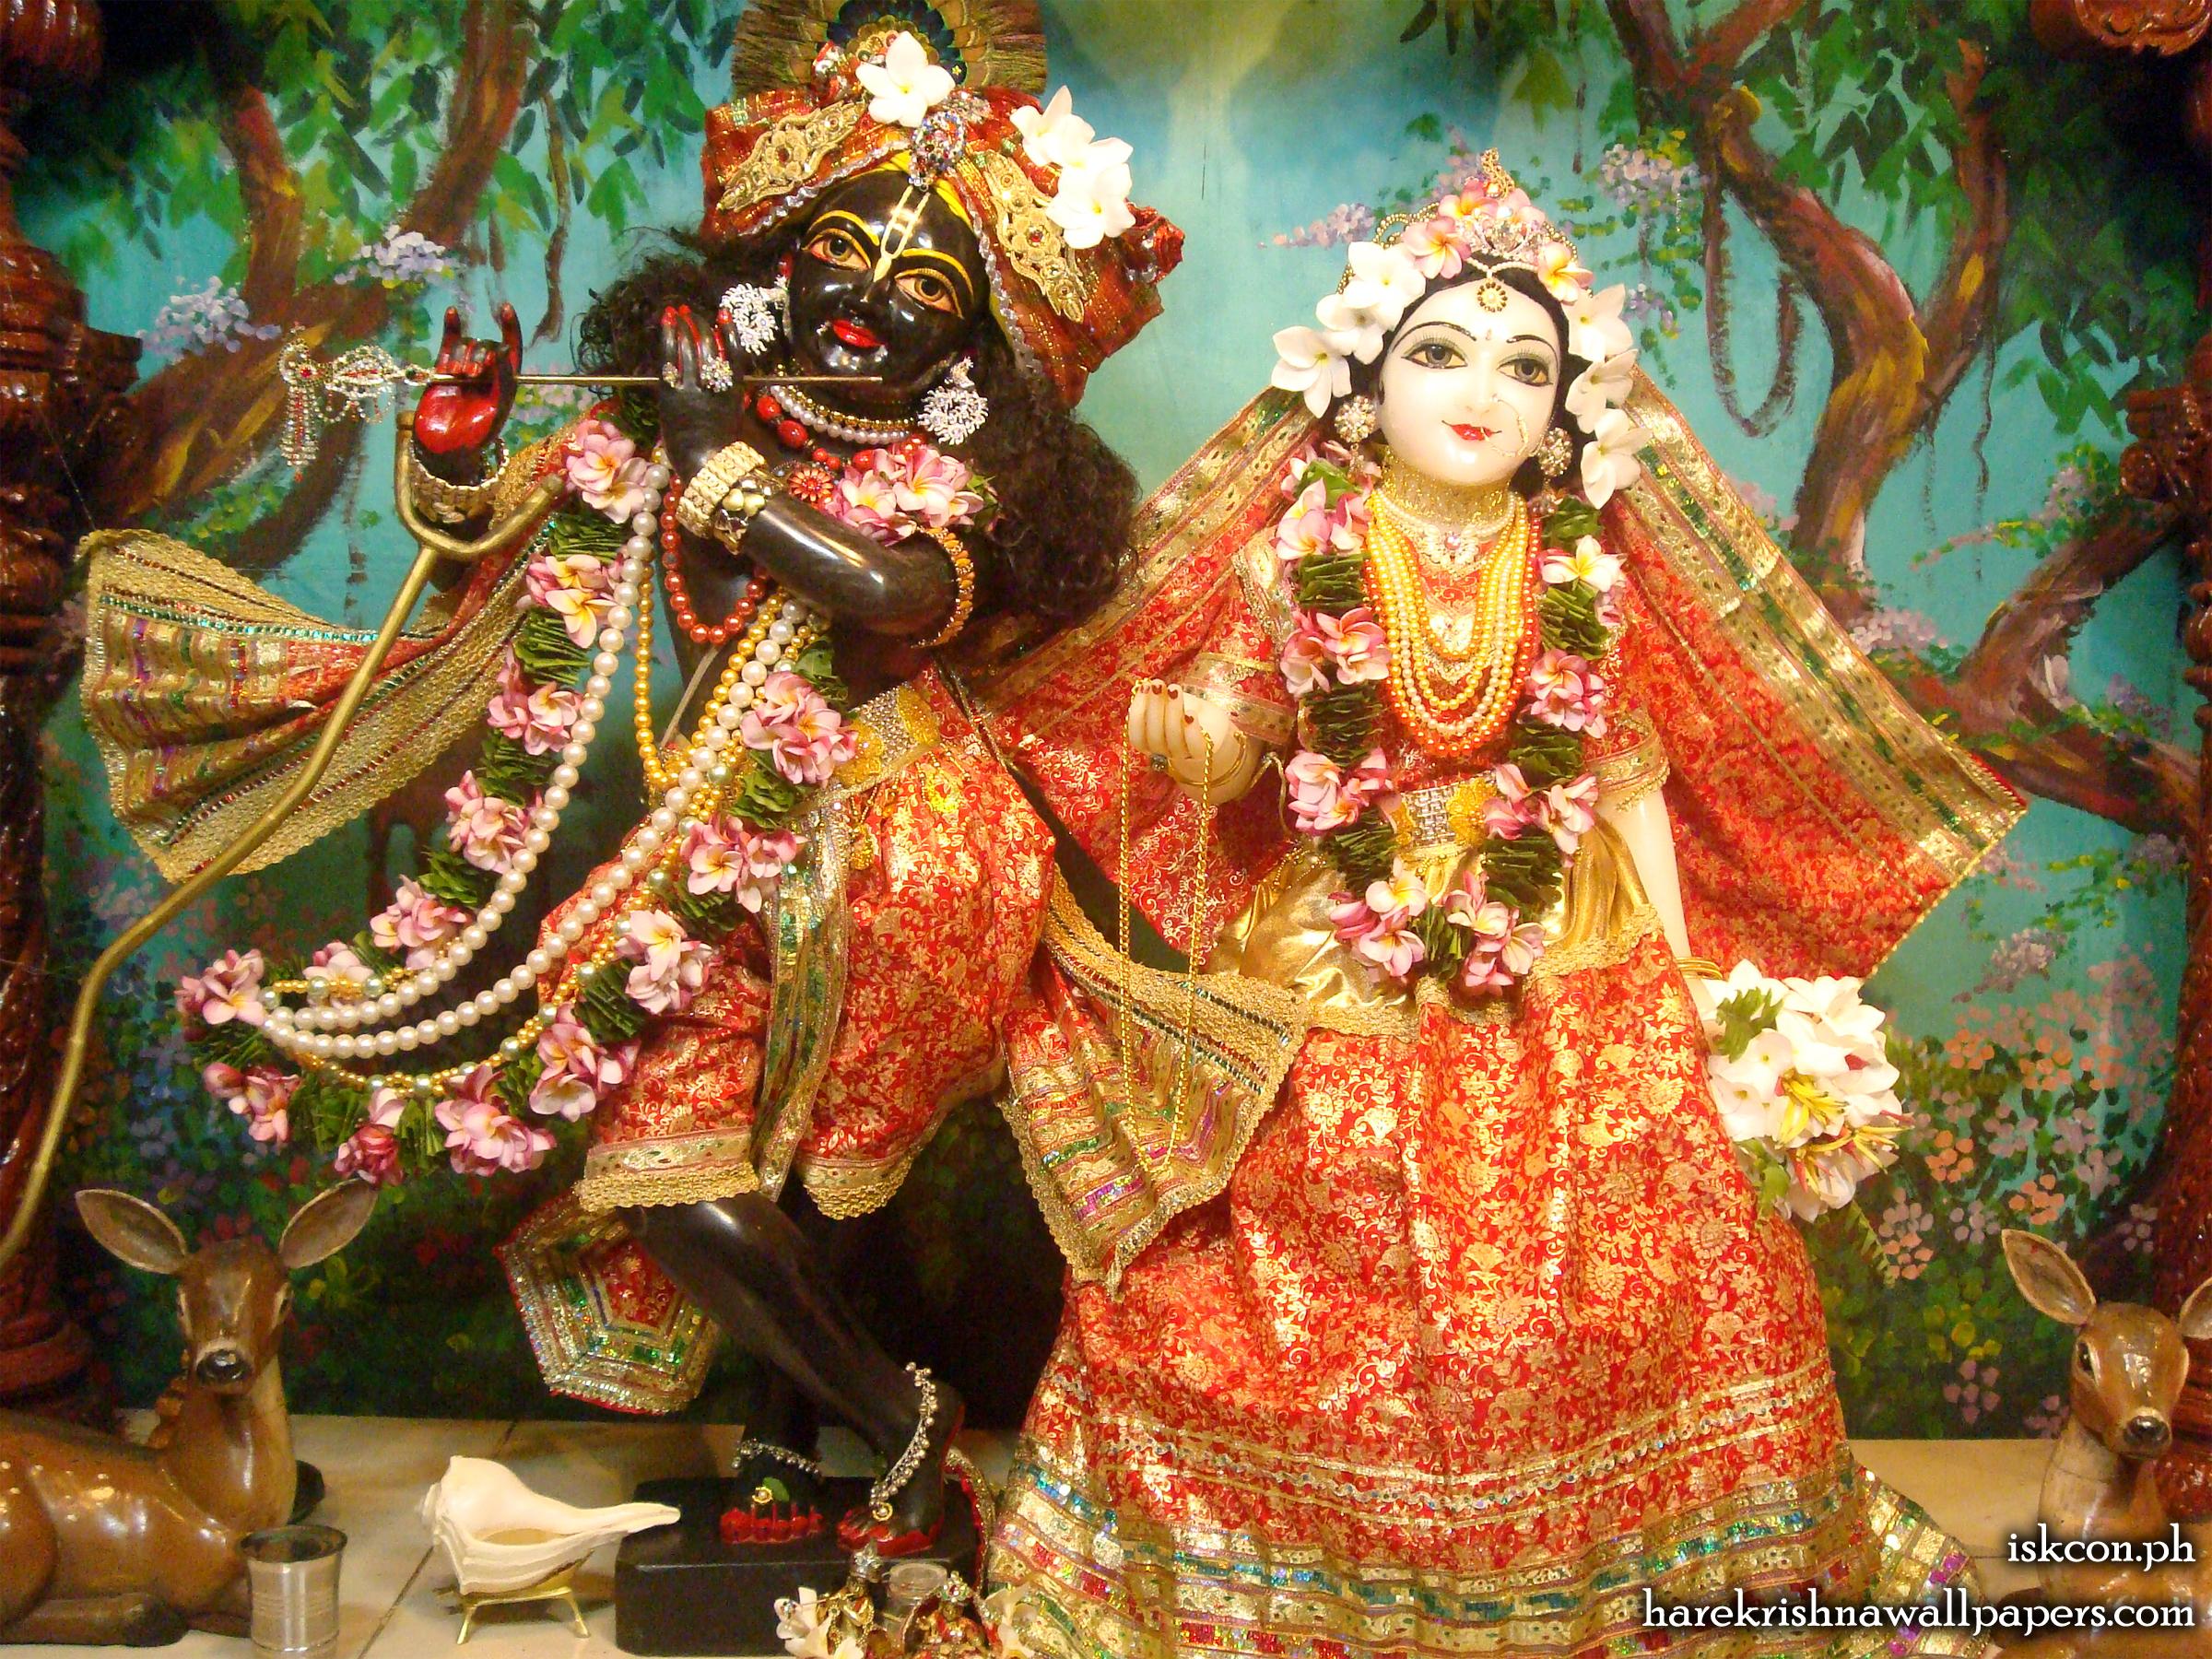 Sri Sri Radha Madhava Wallpaper (012) Size 2400x1800 Download